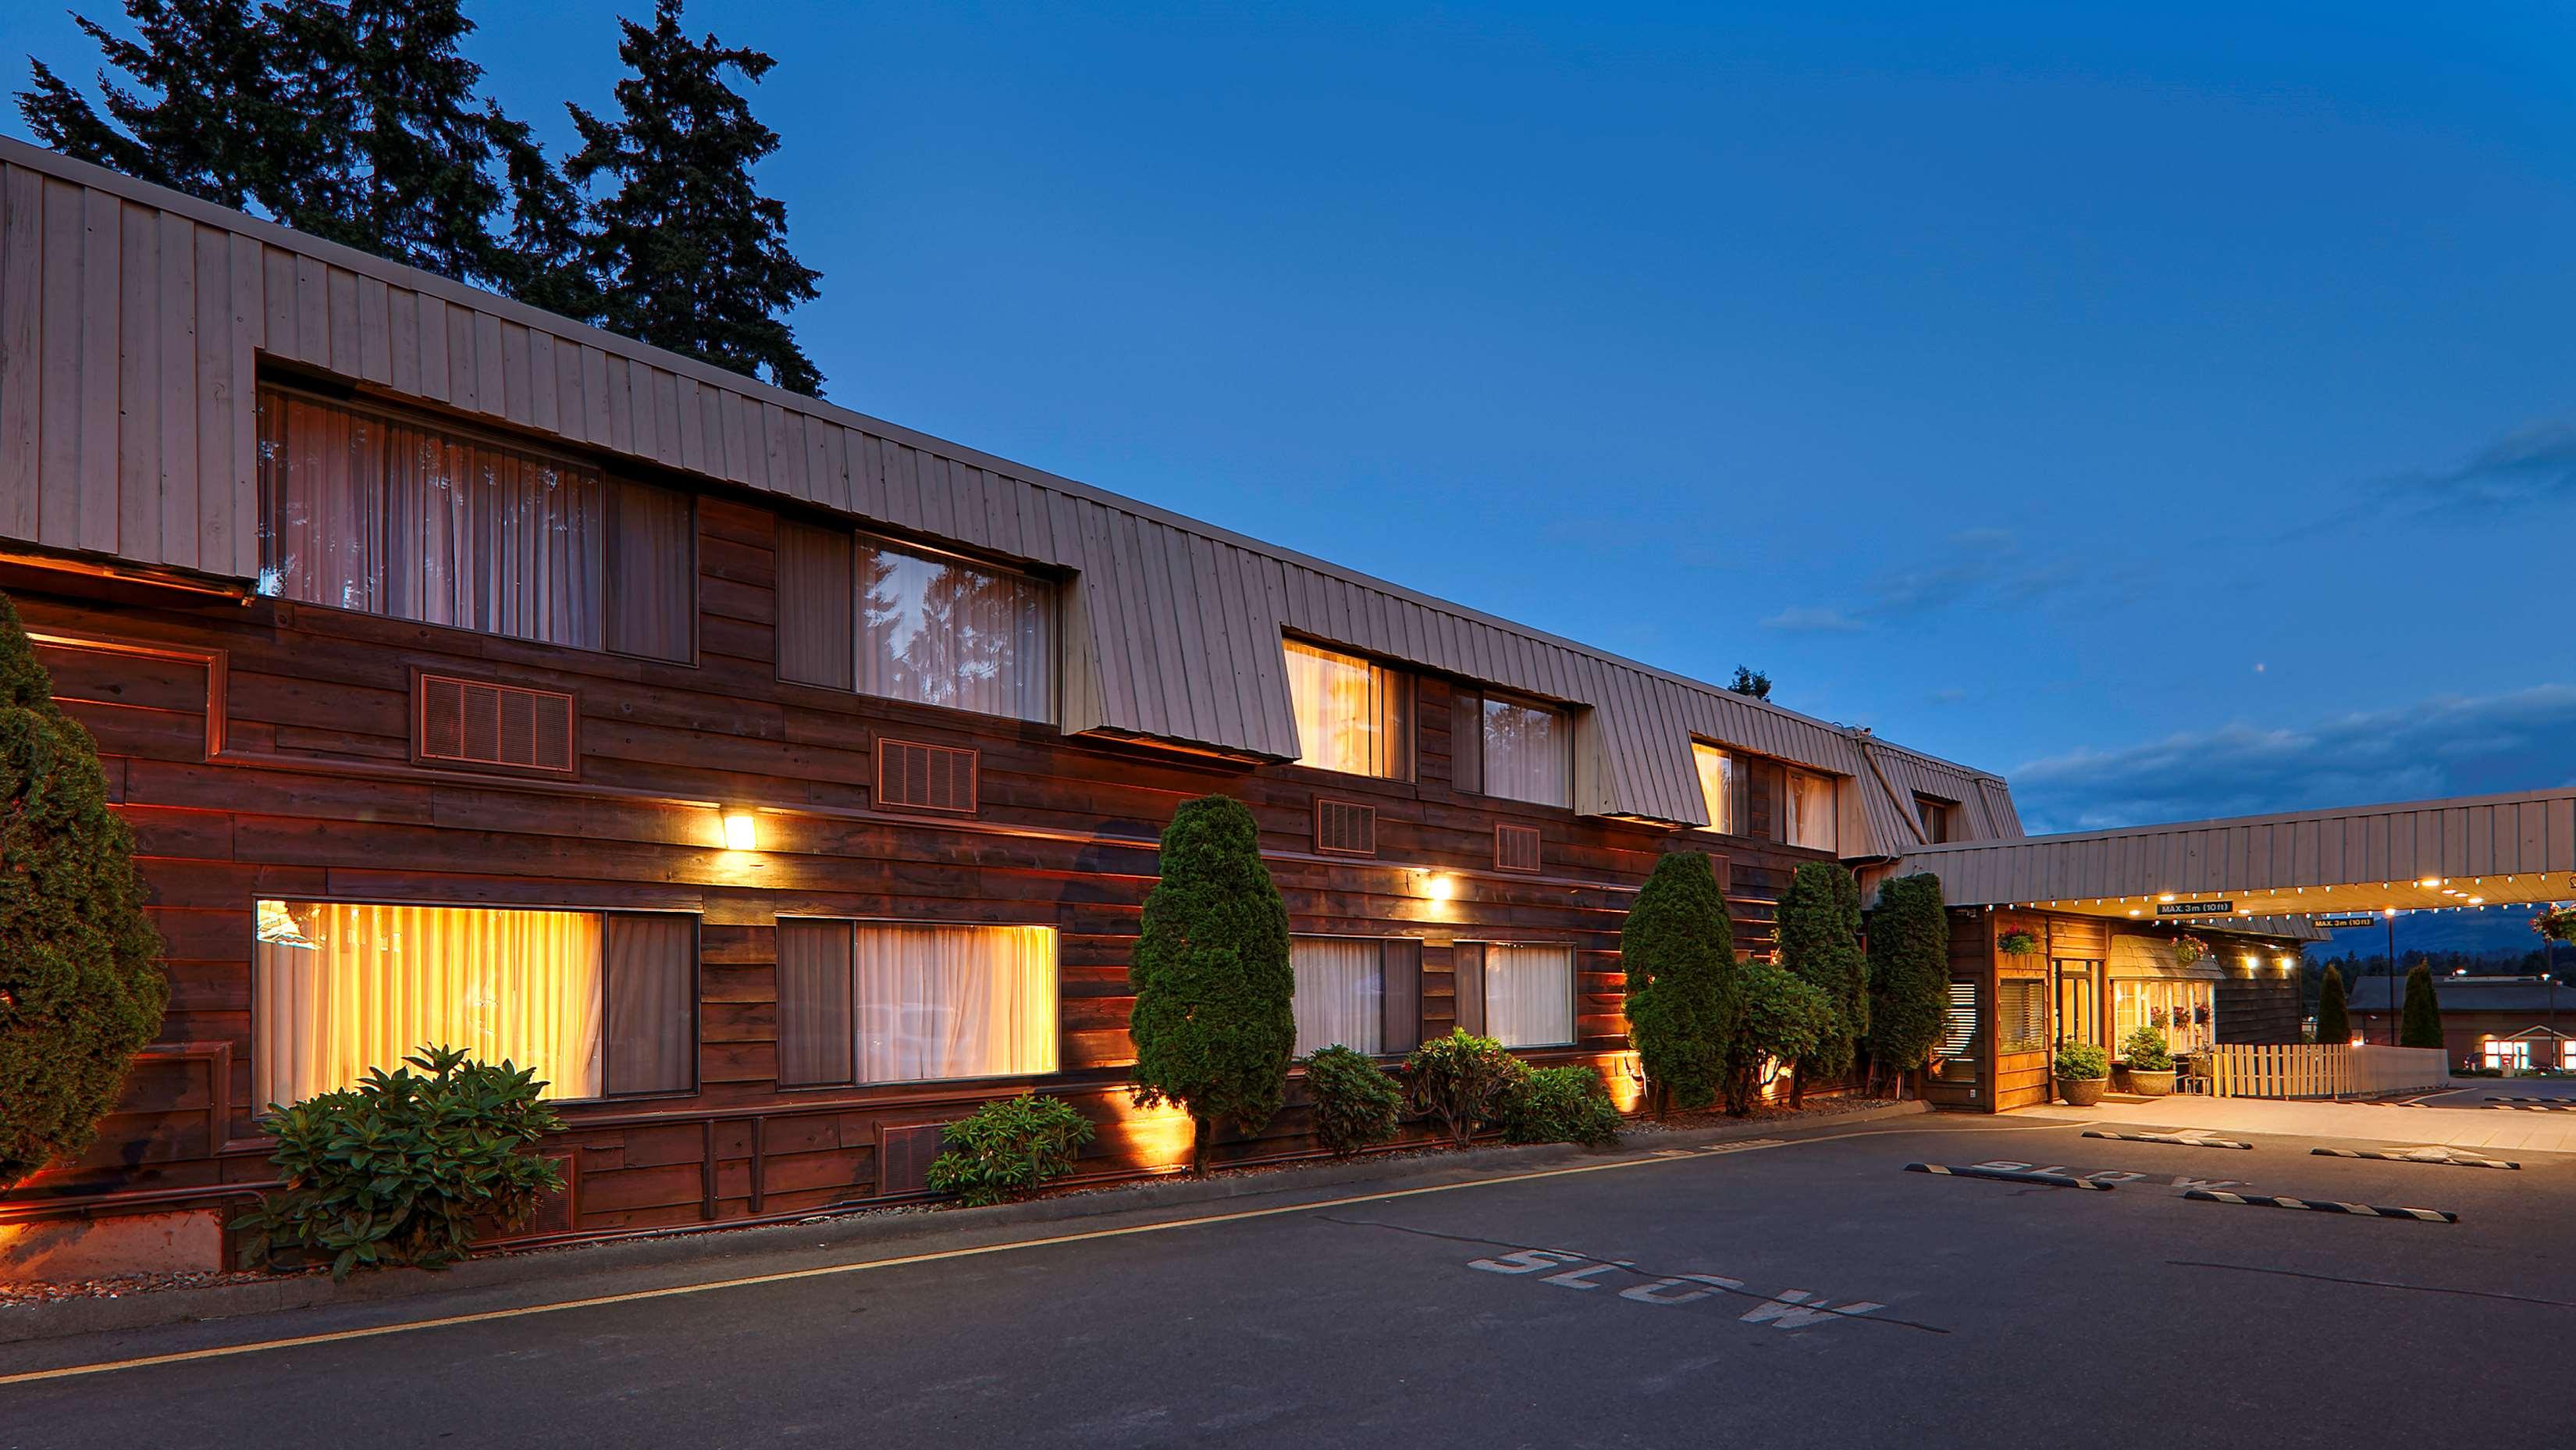 Best Western Cowichan Valley Inn in Duncan: Best Western Cowichan Valley Inn